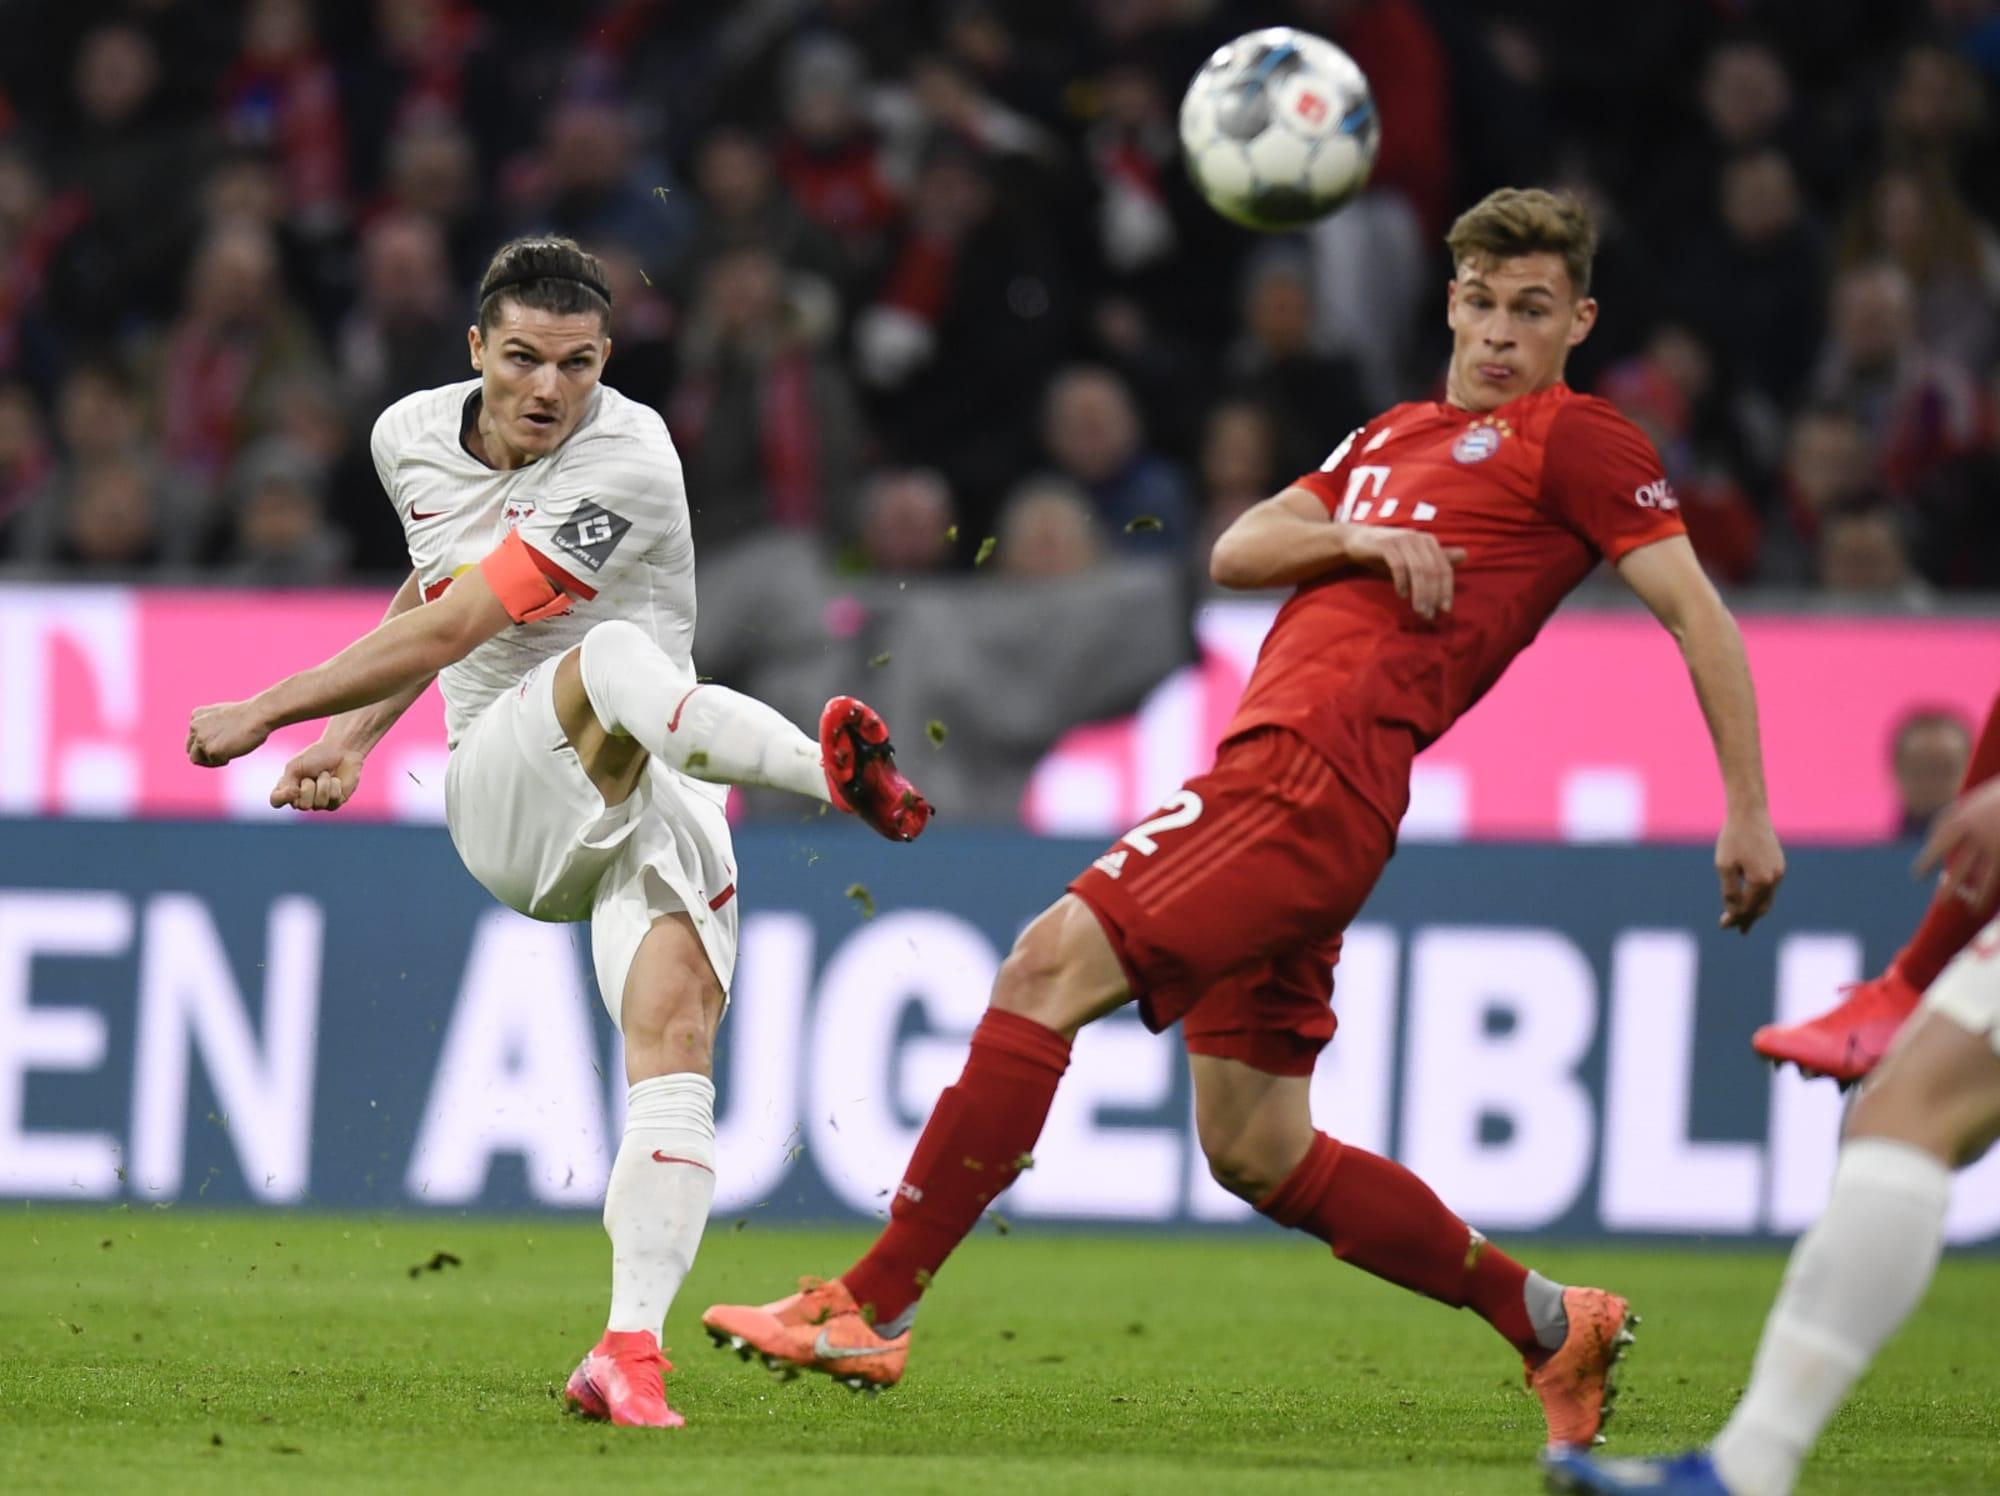 Bayern Munich: Marcel Sabitzer will be a smart acquisition